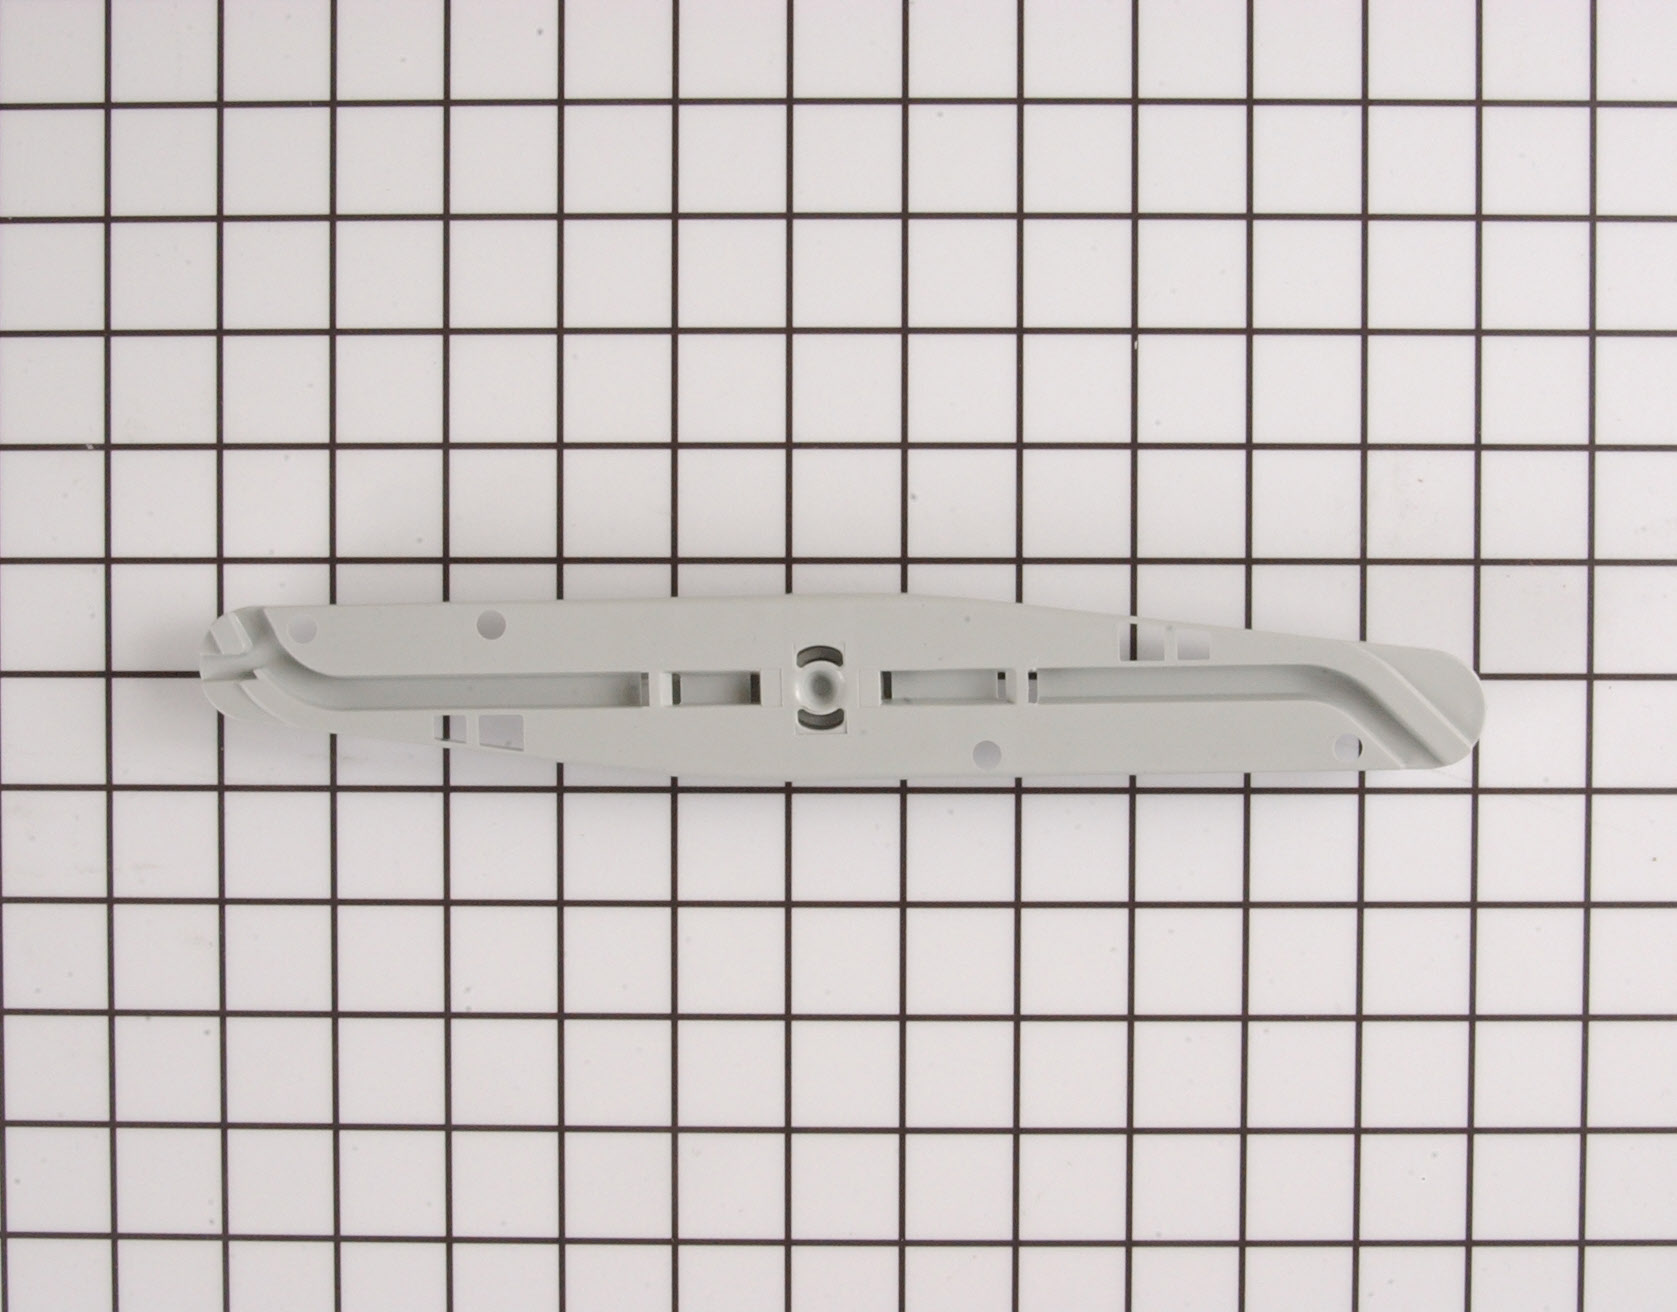 WP6-917644 Crosley Dishwasher Part -Upper Wash Arm Spinner